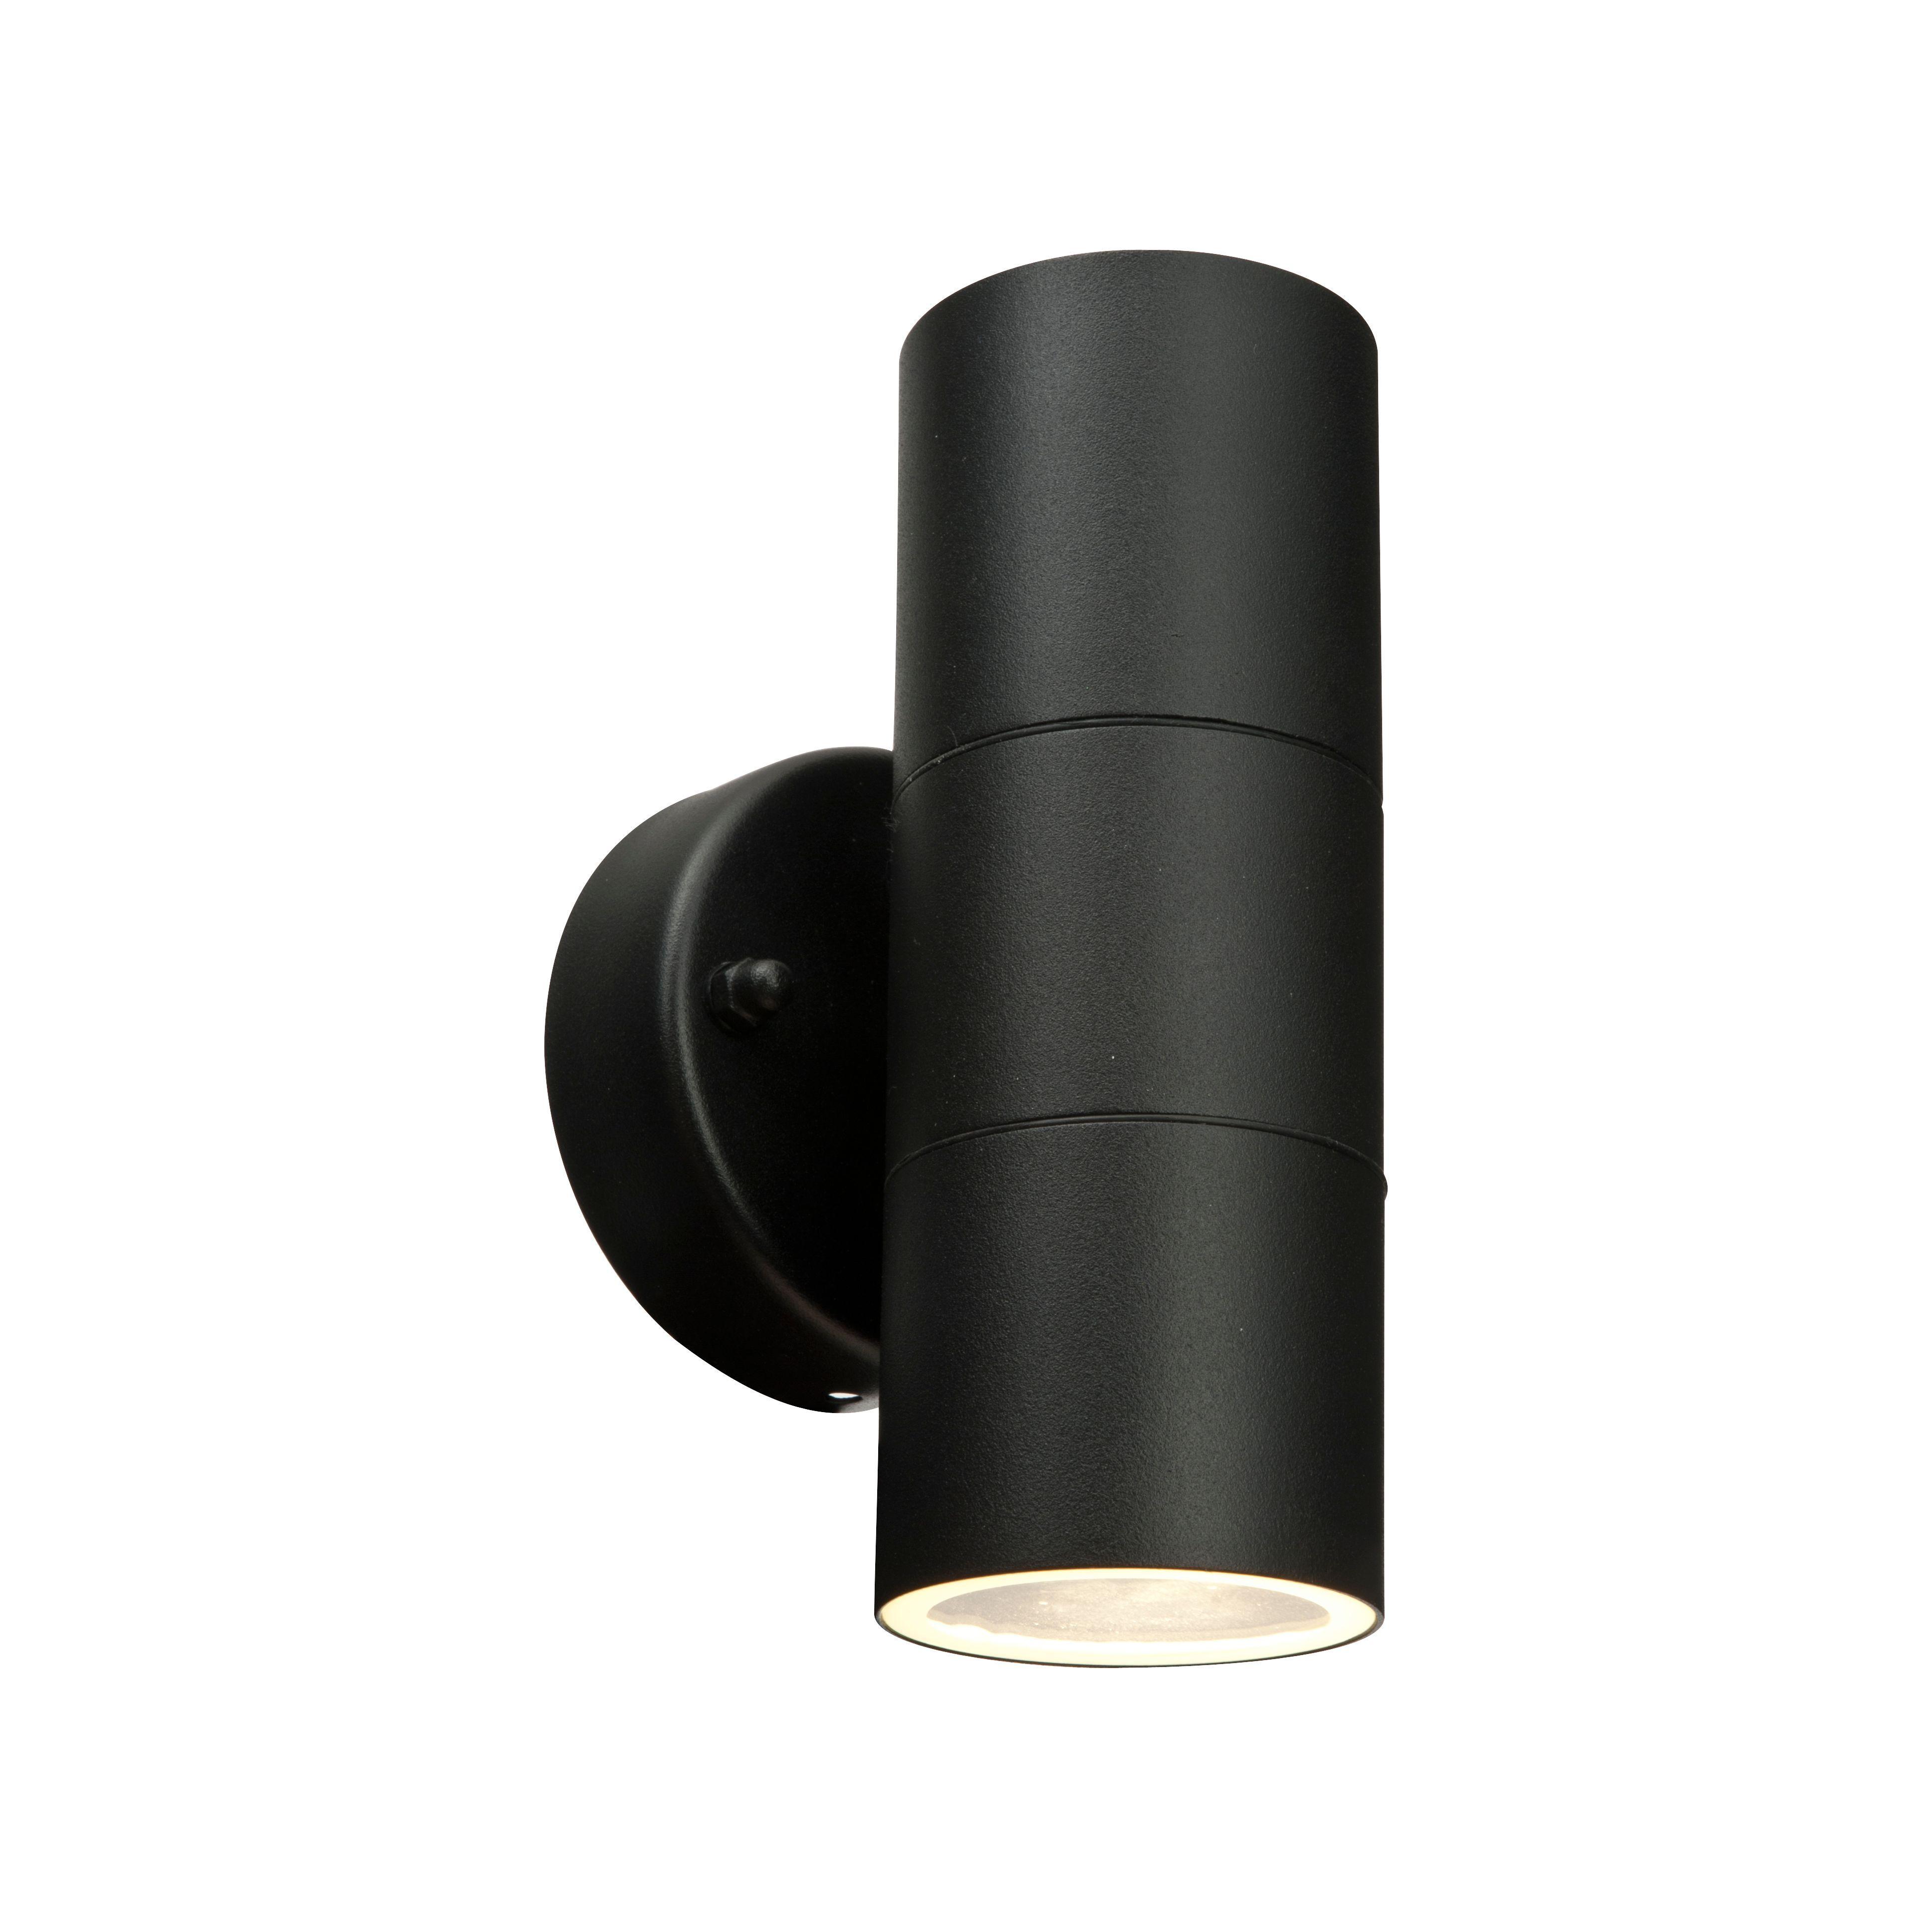 Blooma somnus black mains powered external up u down wall light